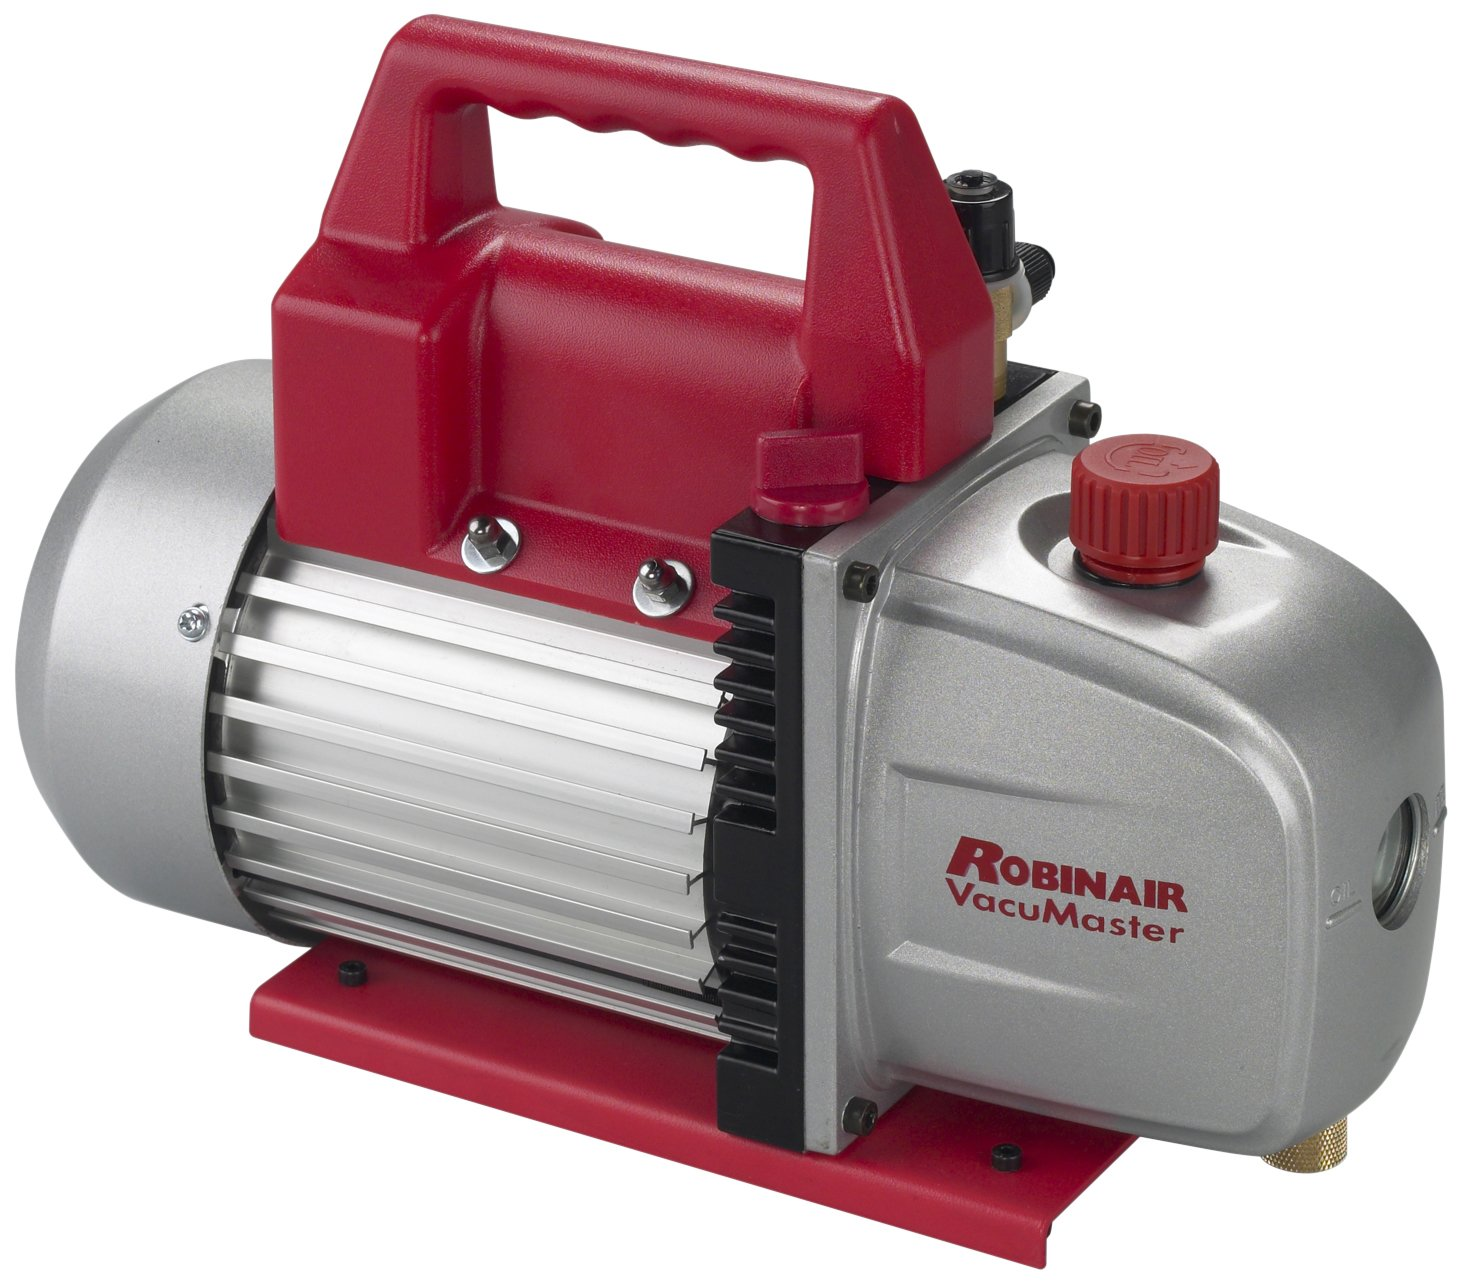 Amazon.com: Robinair (15500) VacuMaster Economy Vacuum Pump - 2-Stage, 5  CFM: Automotive